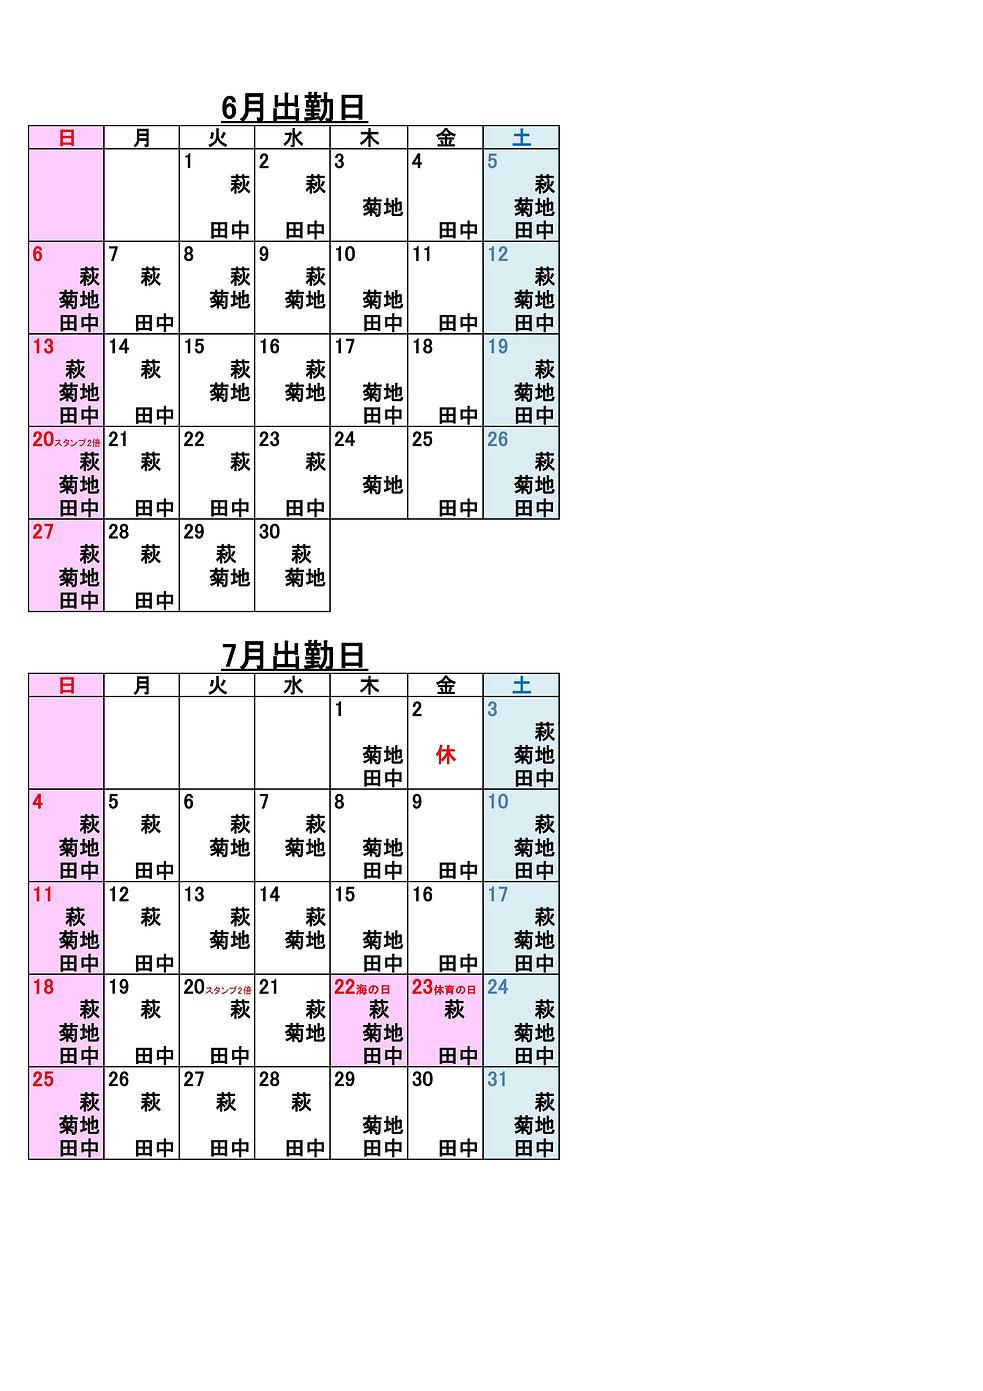 6853874c73ab4d2ea06ebd0e0ba7f389-0001 (1